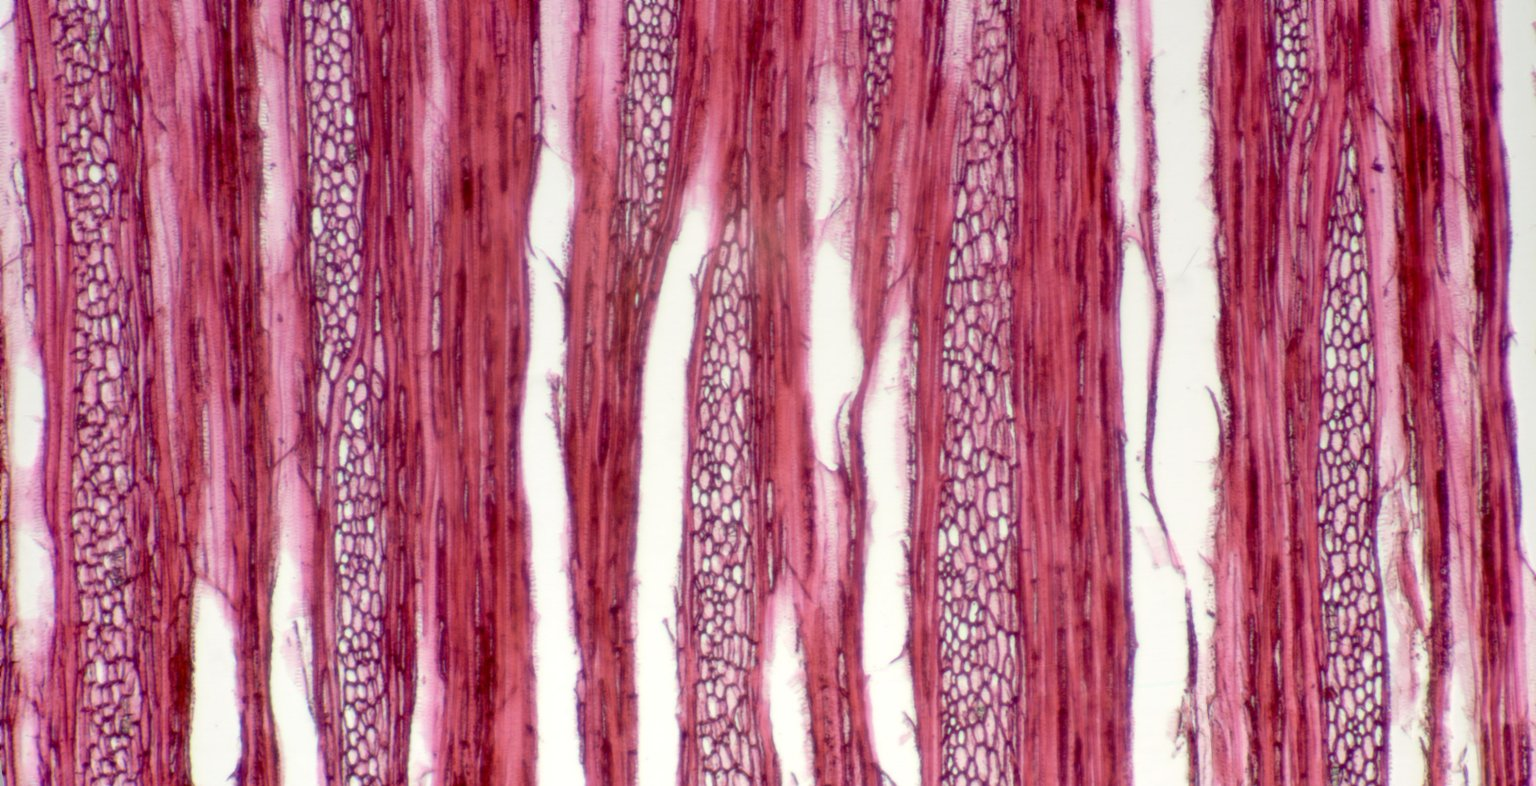 ERICACEAE Themistoclesia pendula